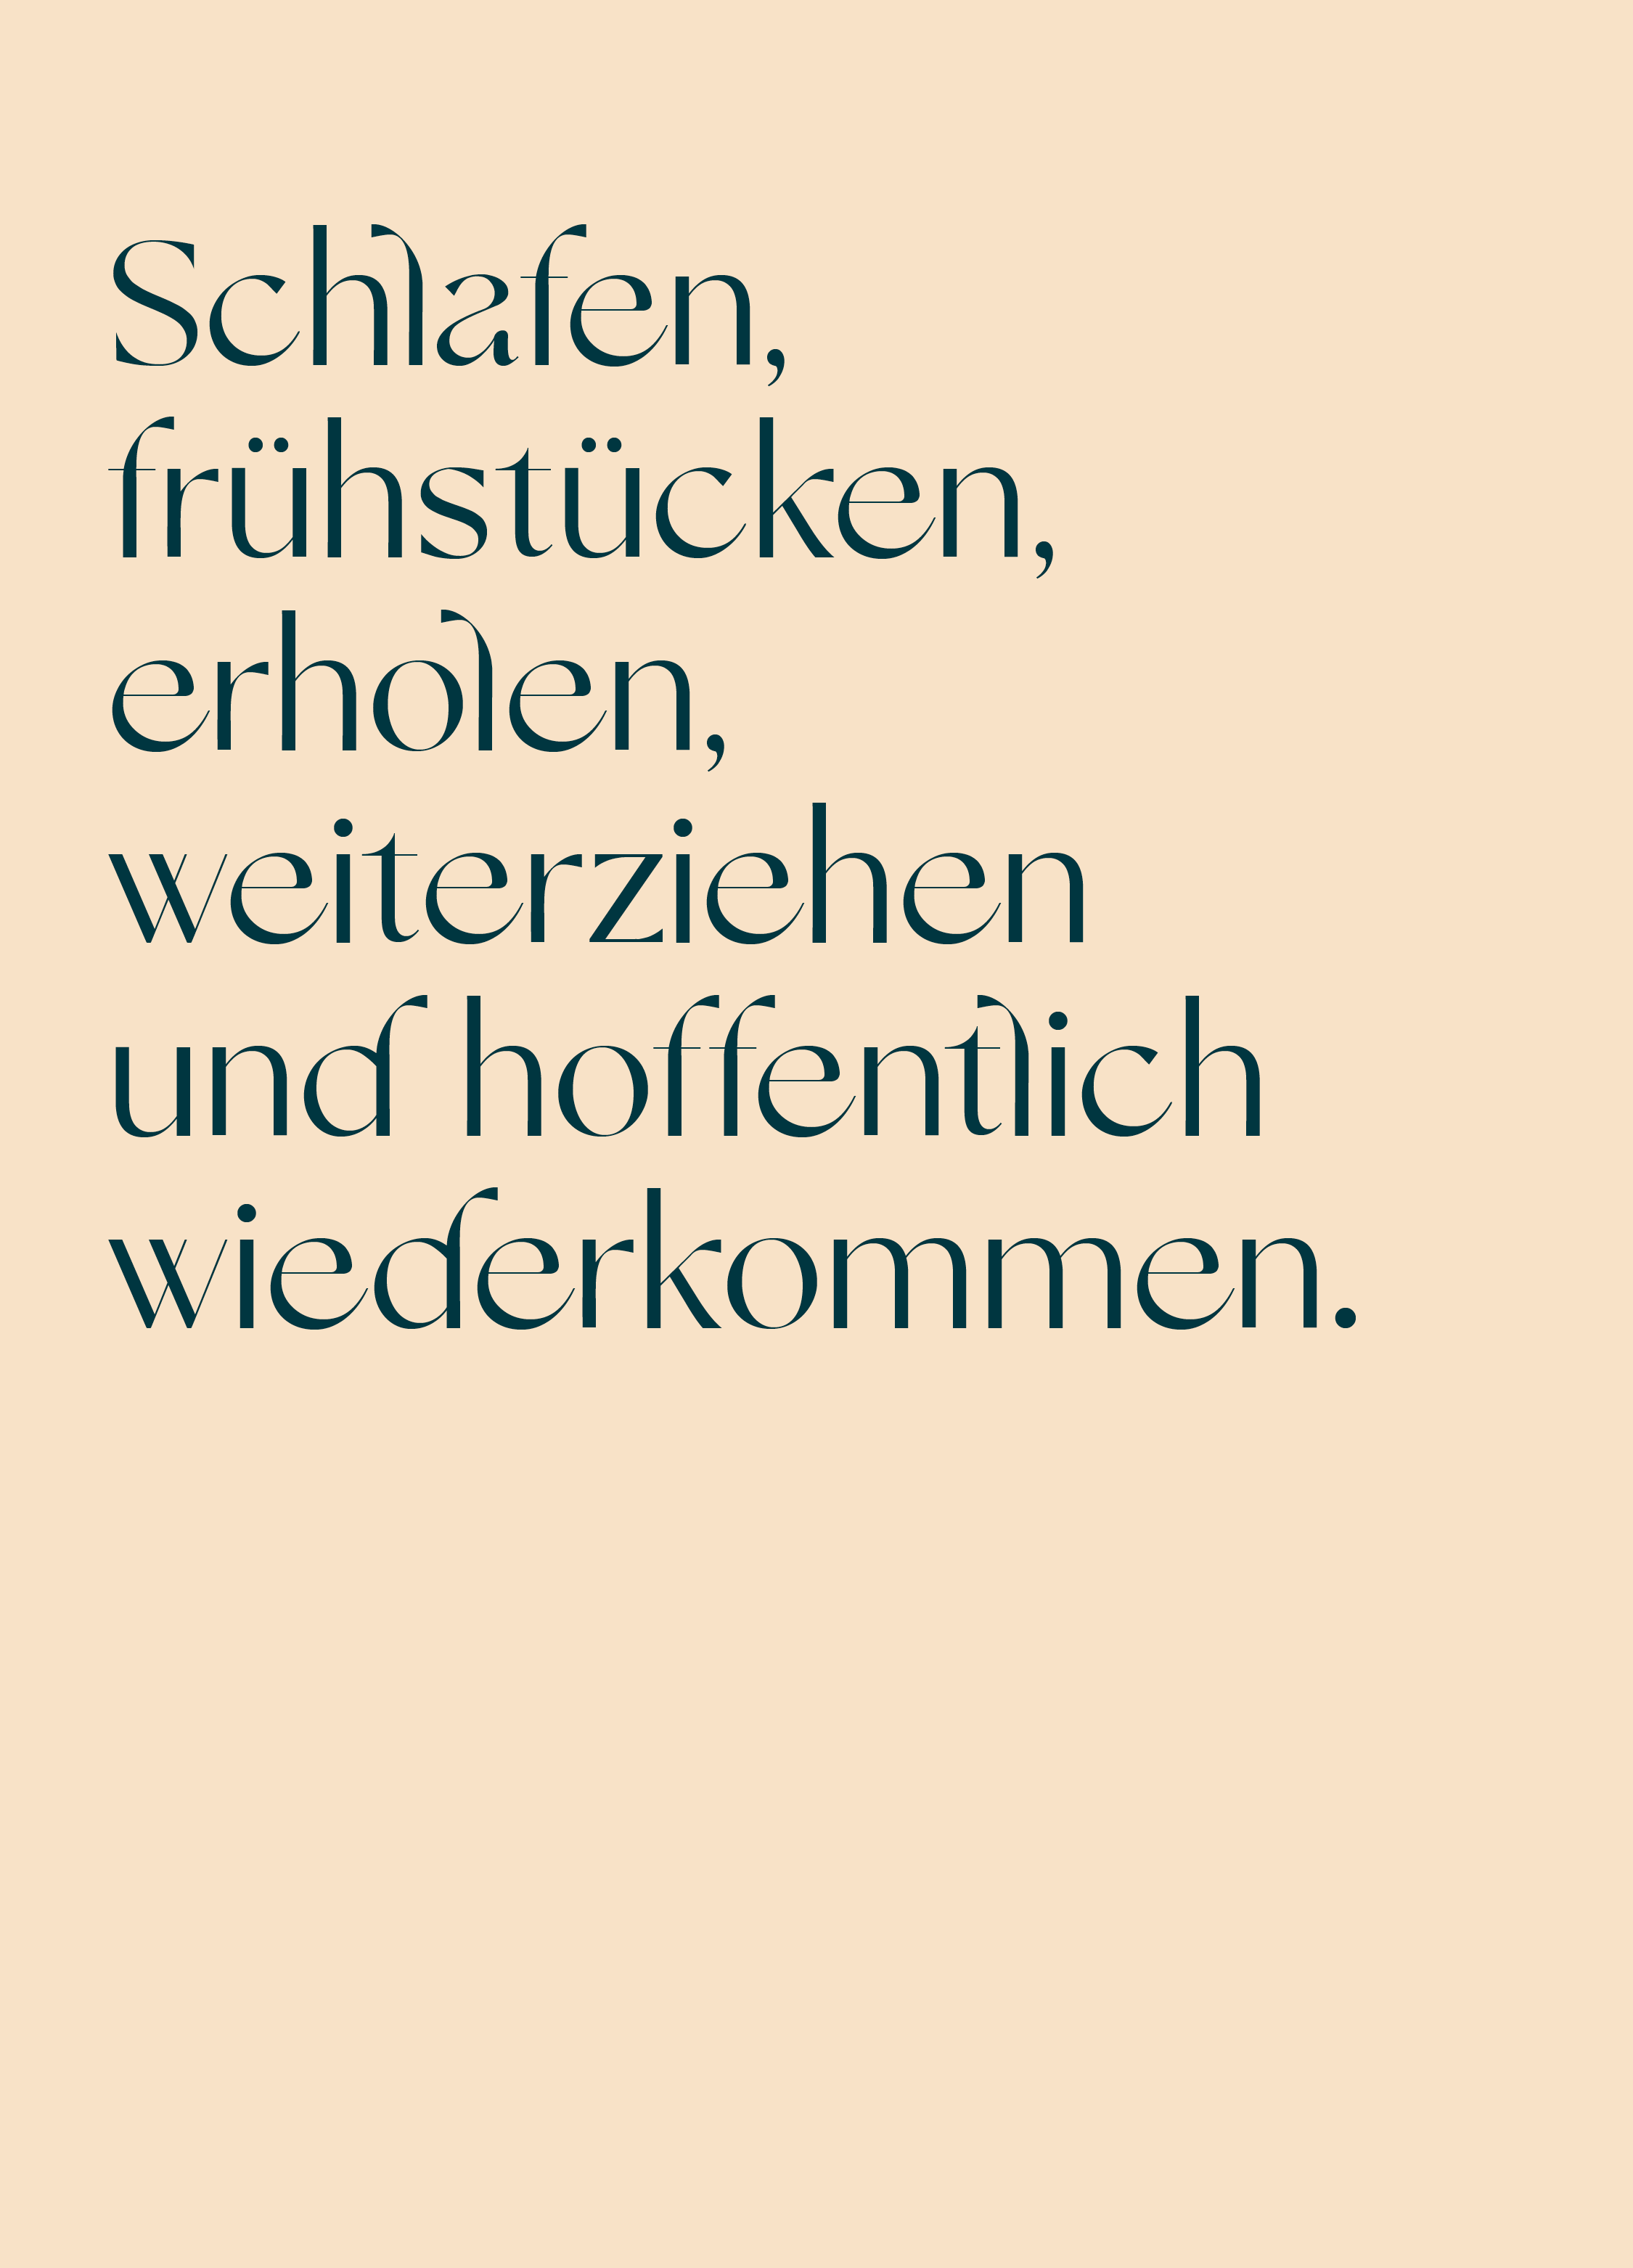 Ref Faehrfrau Website 22 Text